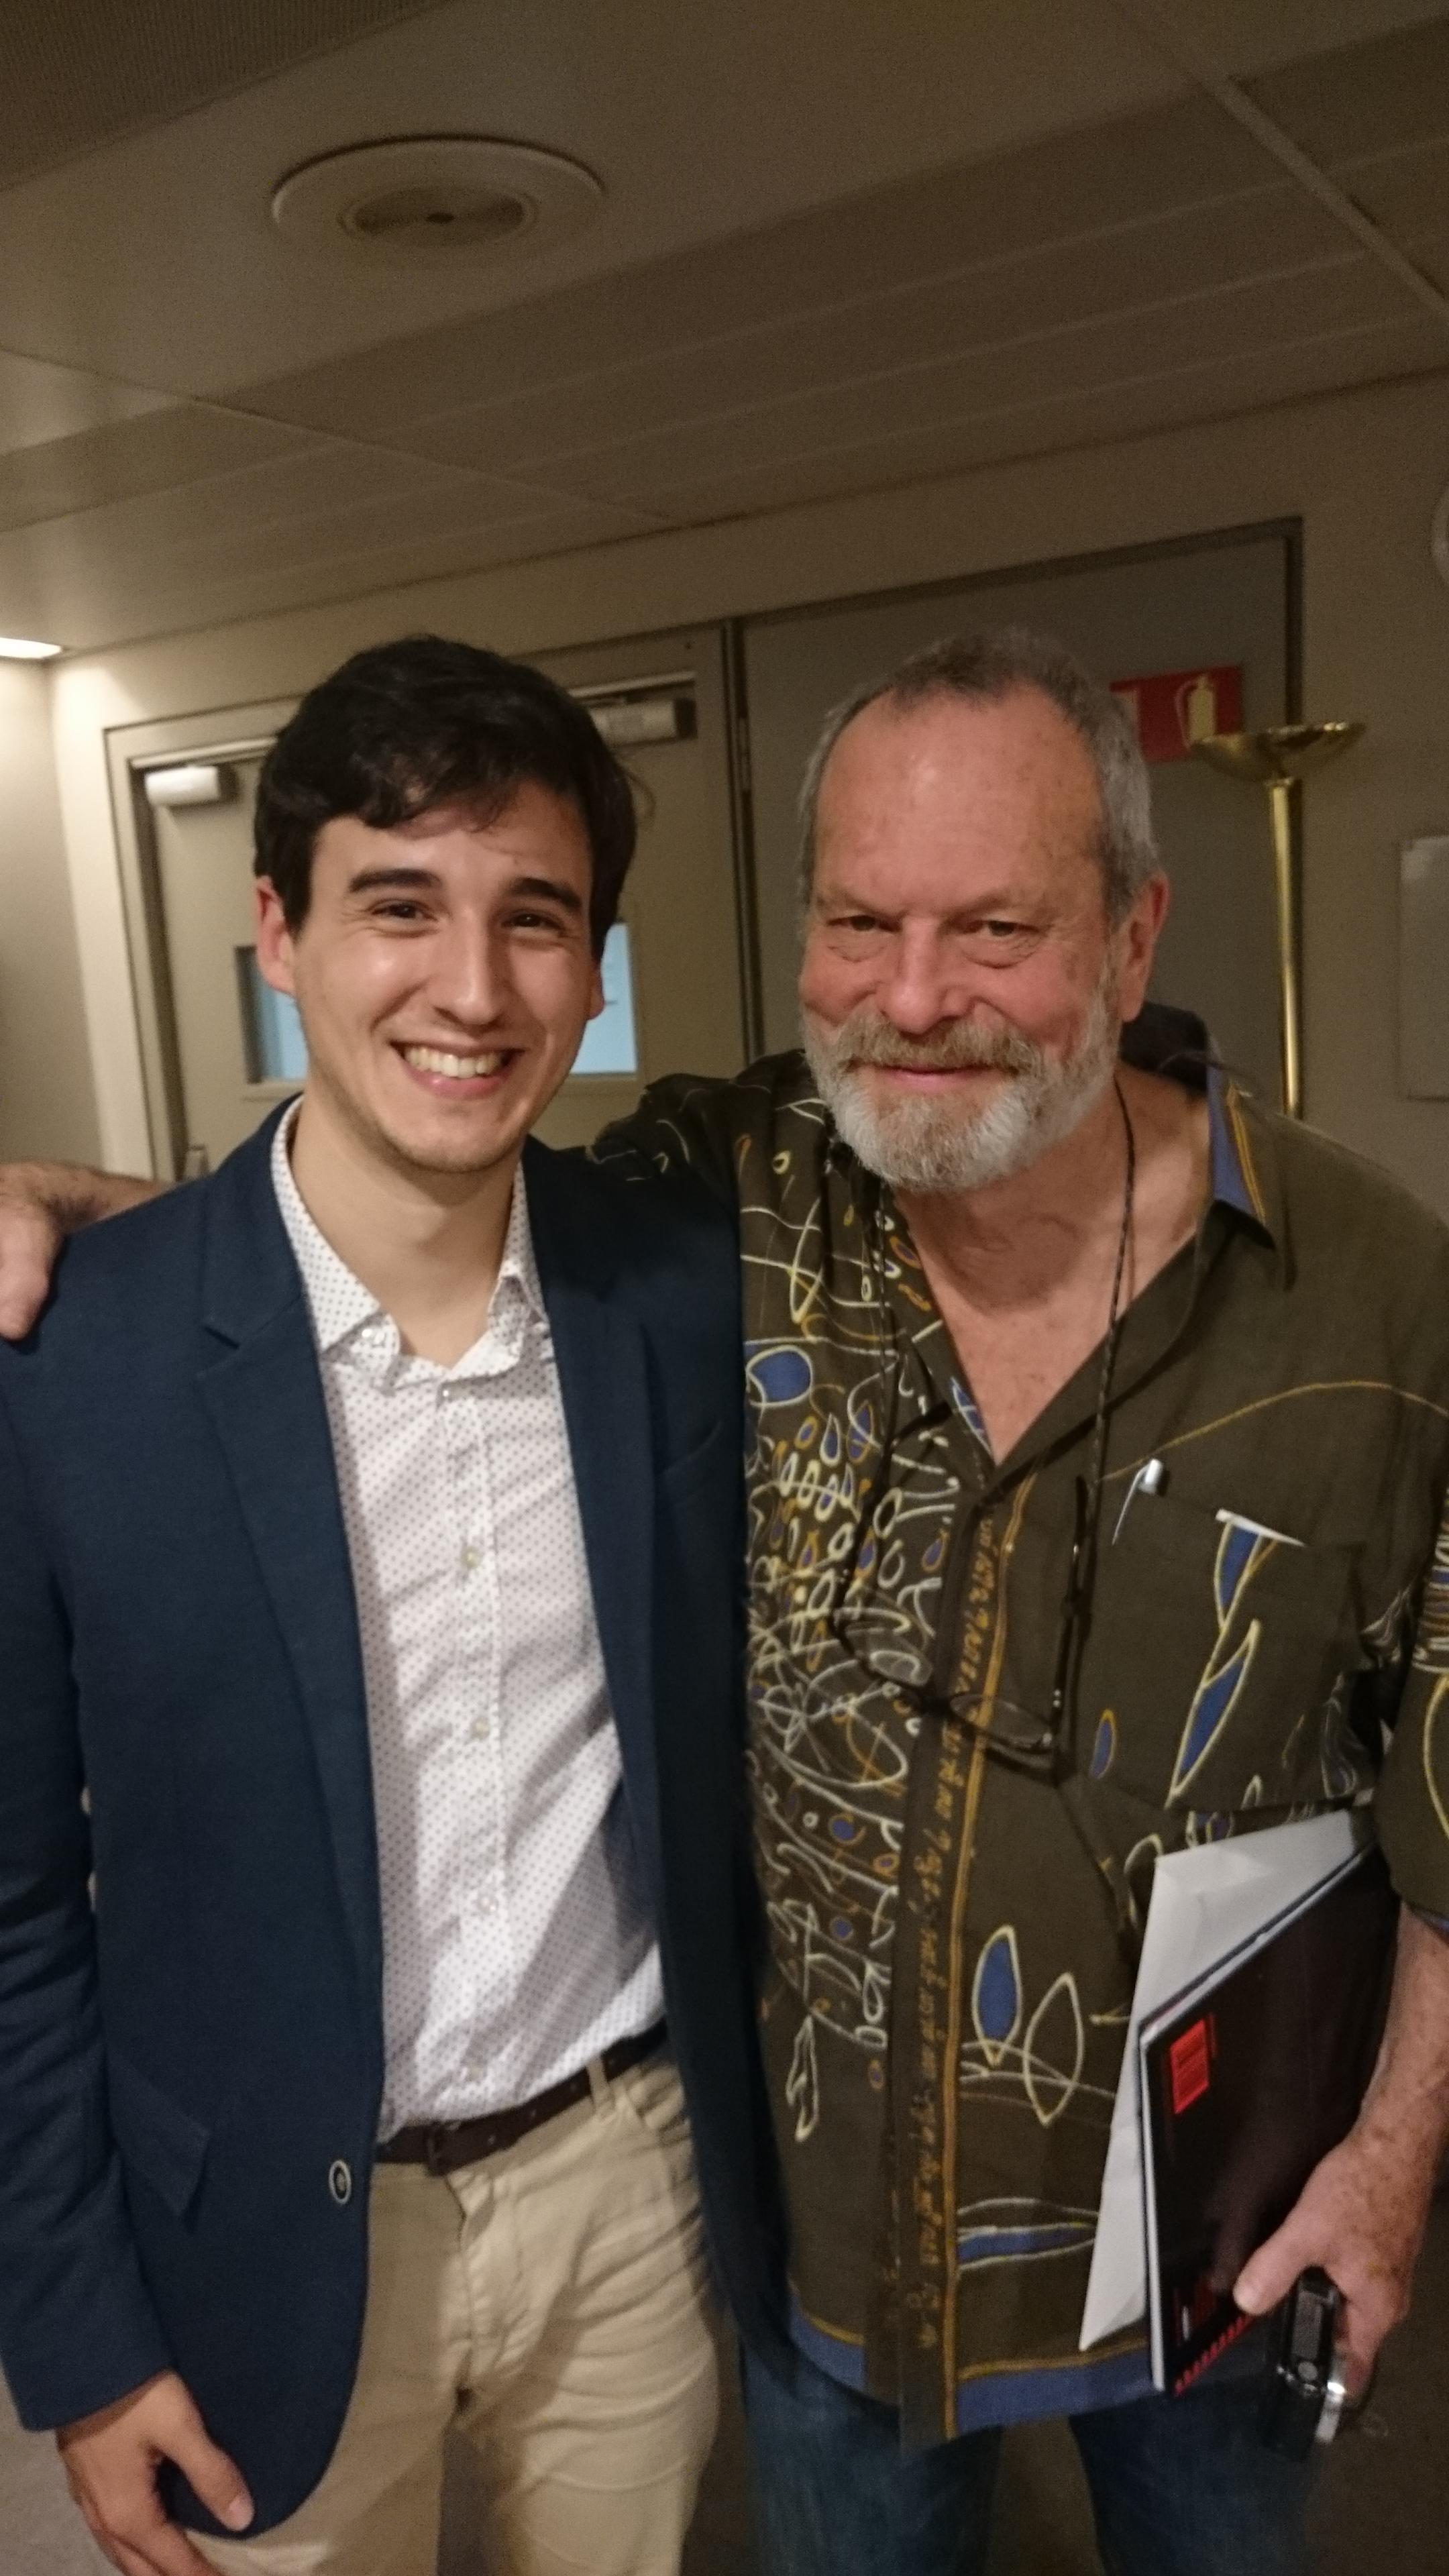 Con Terry Gilliam (Monty Python)